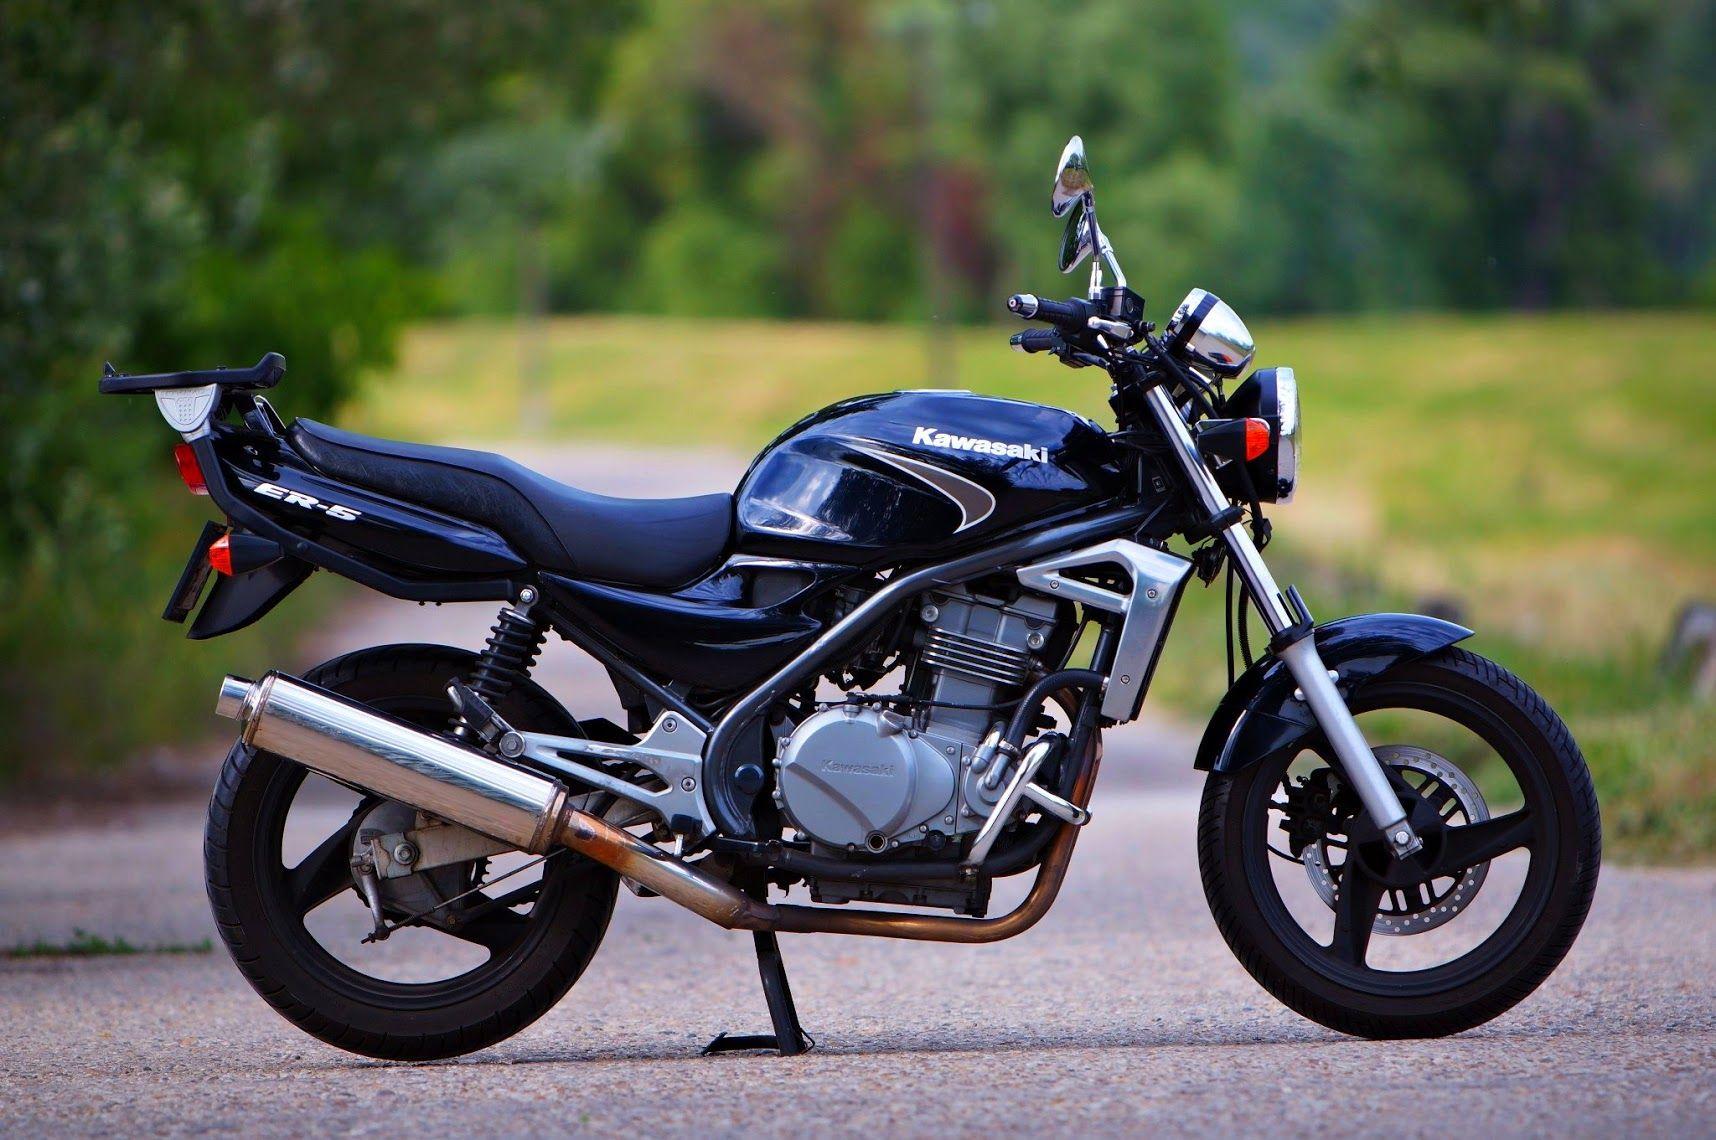 kawasaki er 5 motorok motorbikes motorcycles pinterest. Black Bedroom Furniture Sets. Home Design Ideas